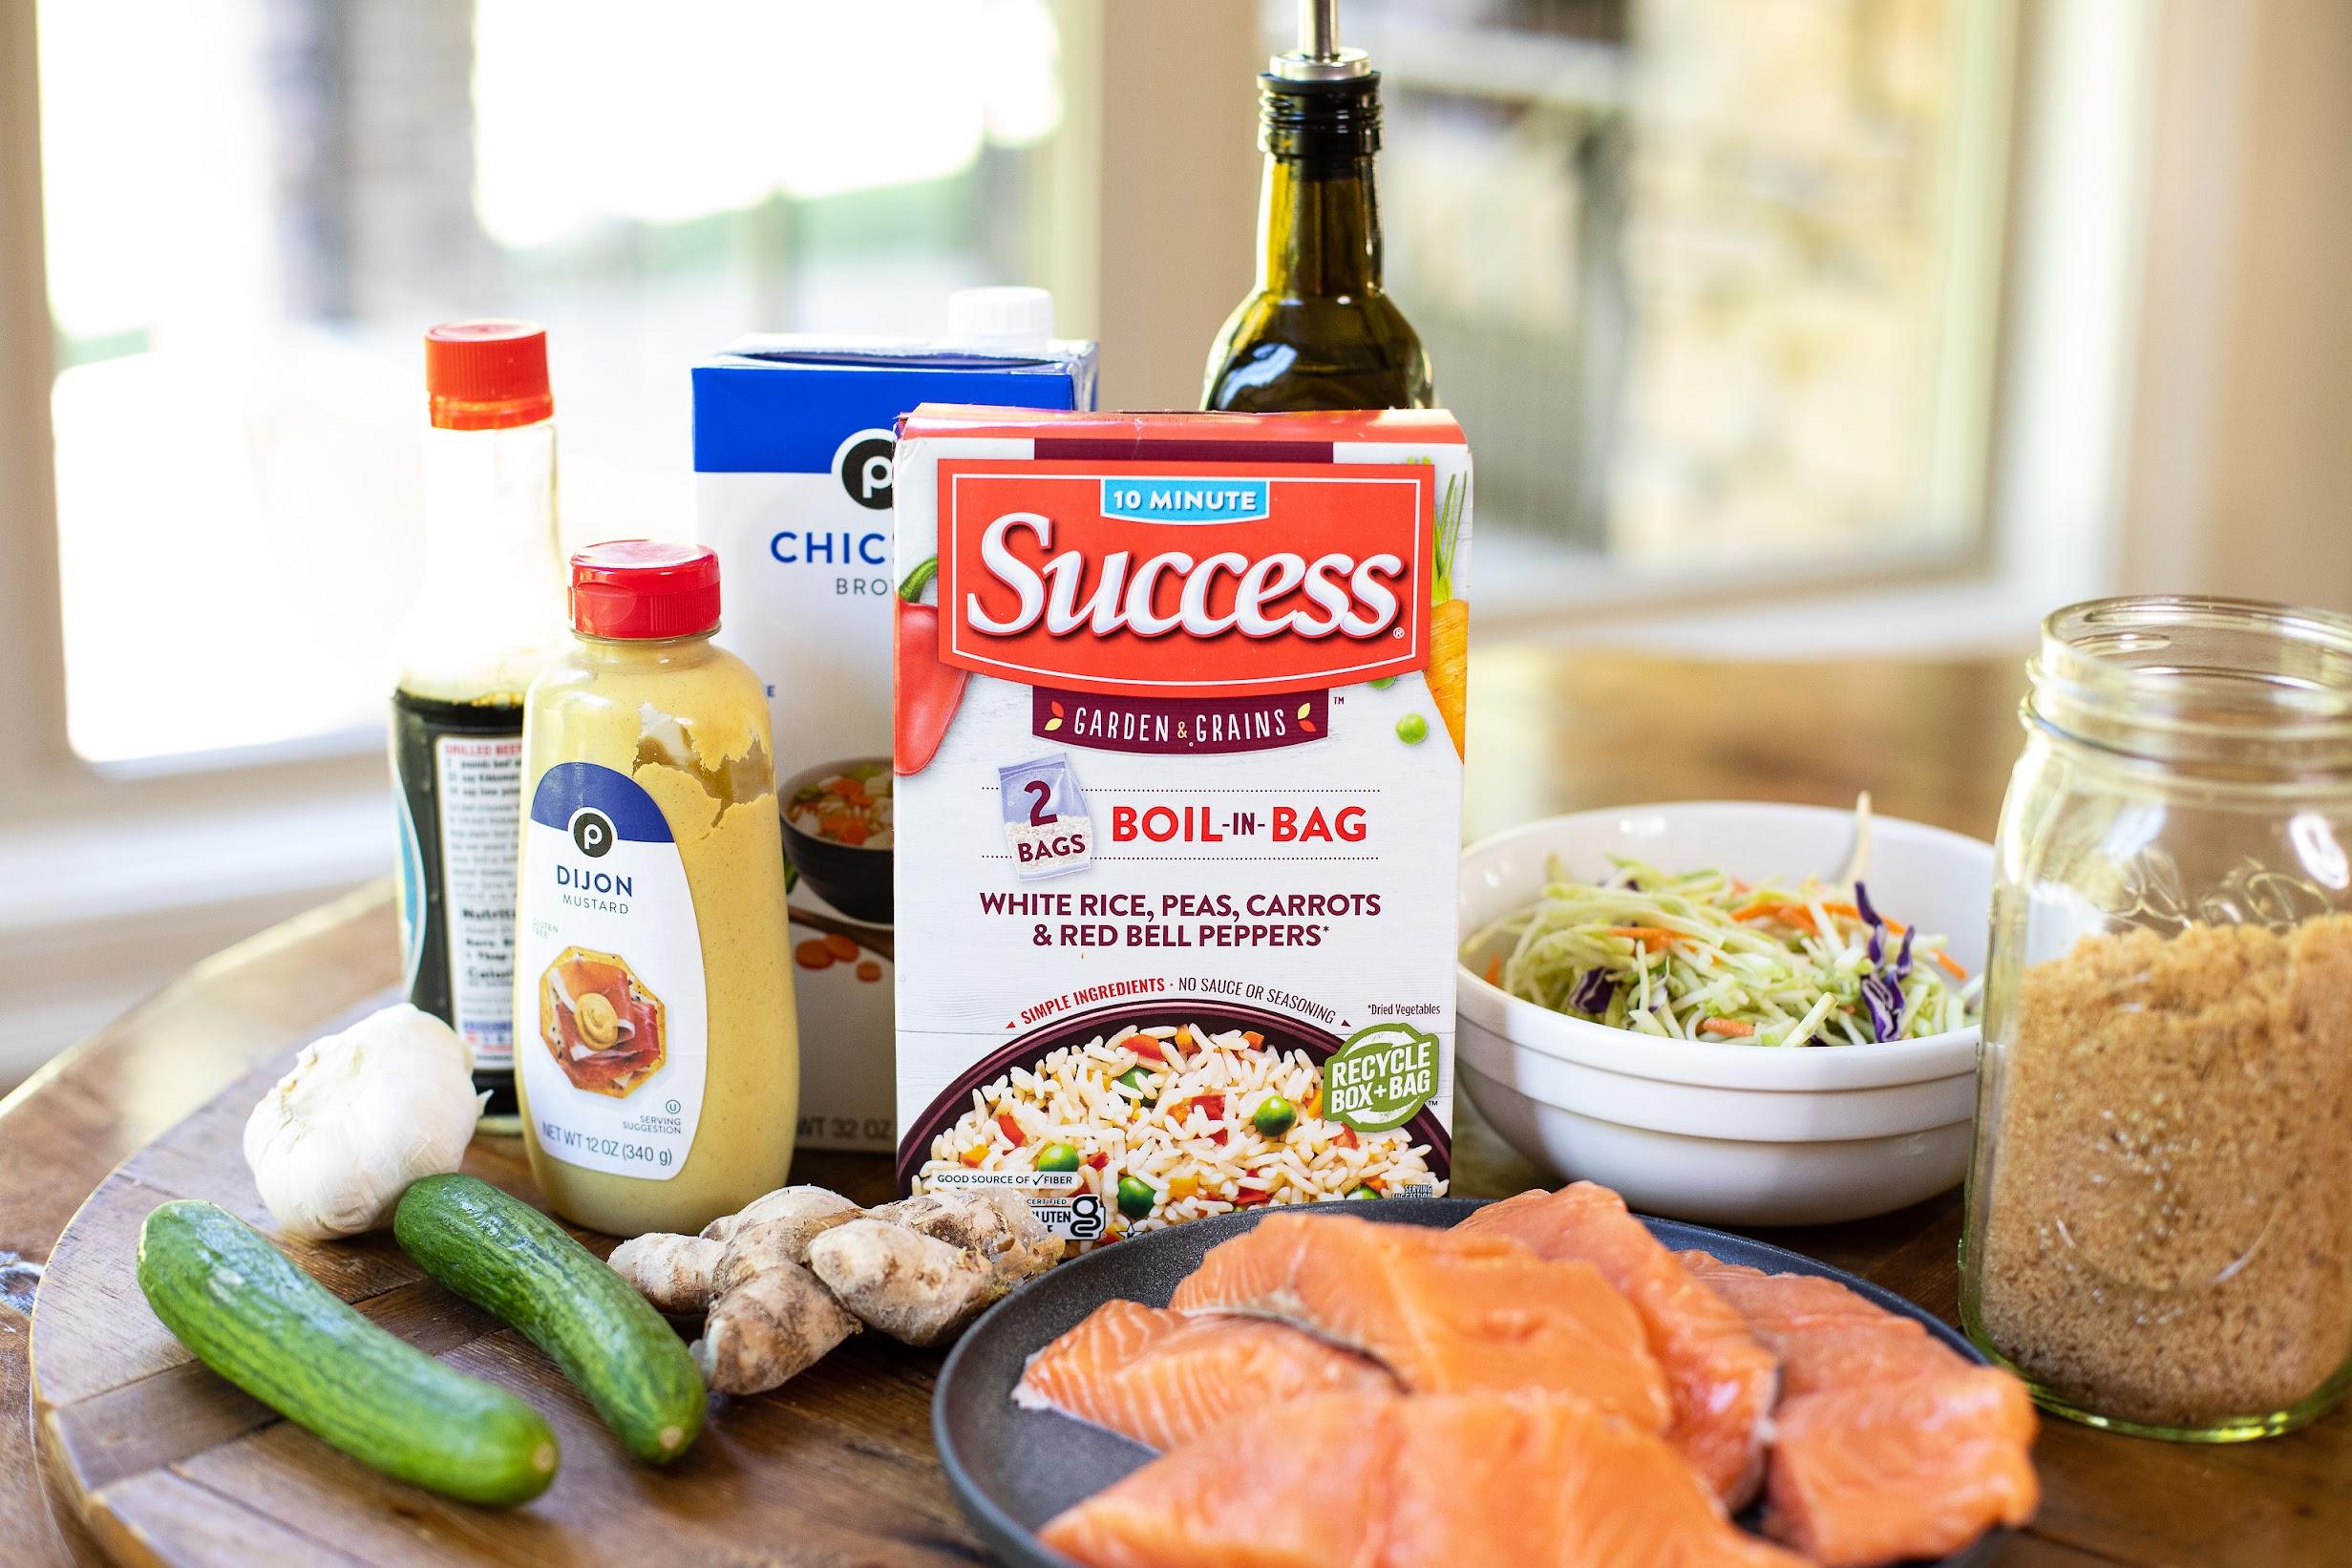 Garden & Grains Asian Salmon Draft on I Heart Publix 2